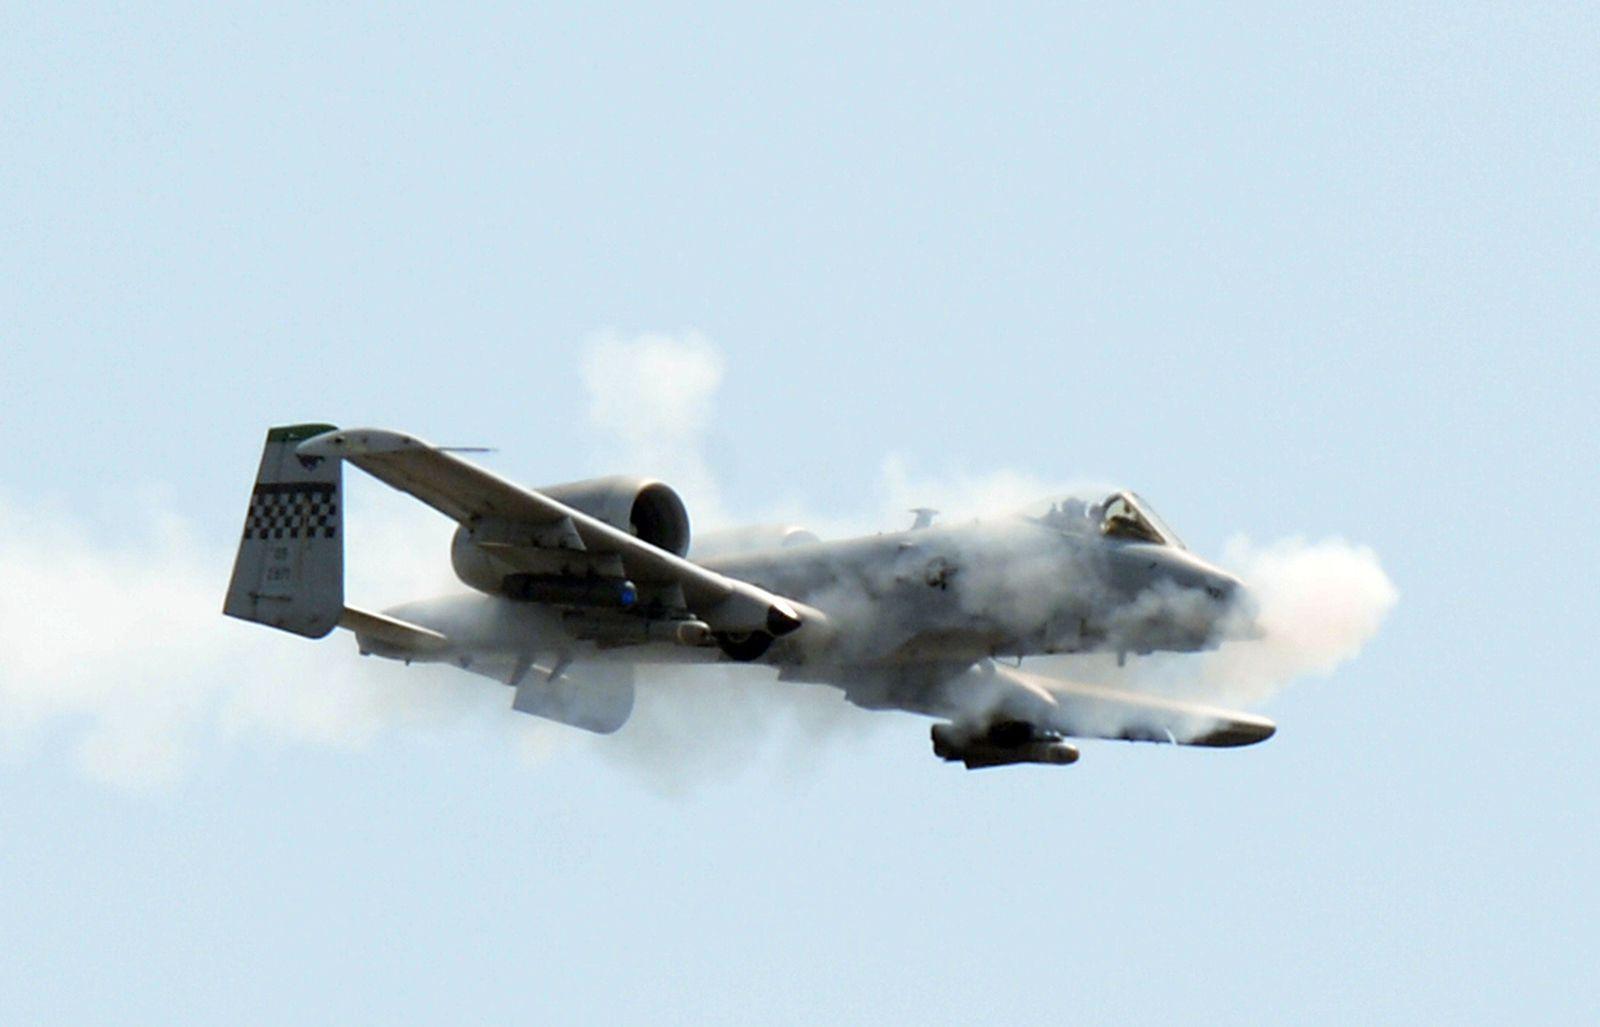 US Air Force A-10 Thunderbolt II Kampfjet